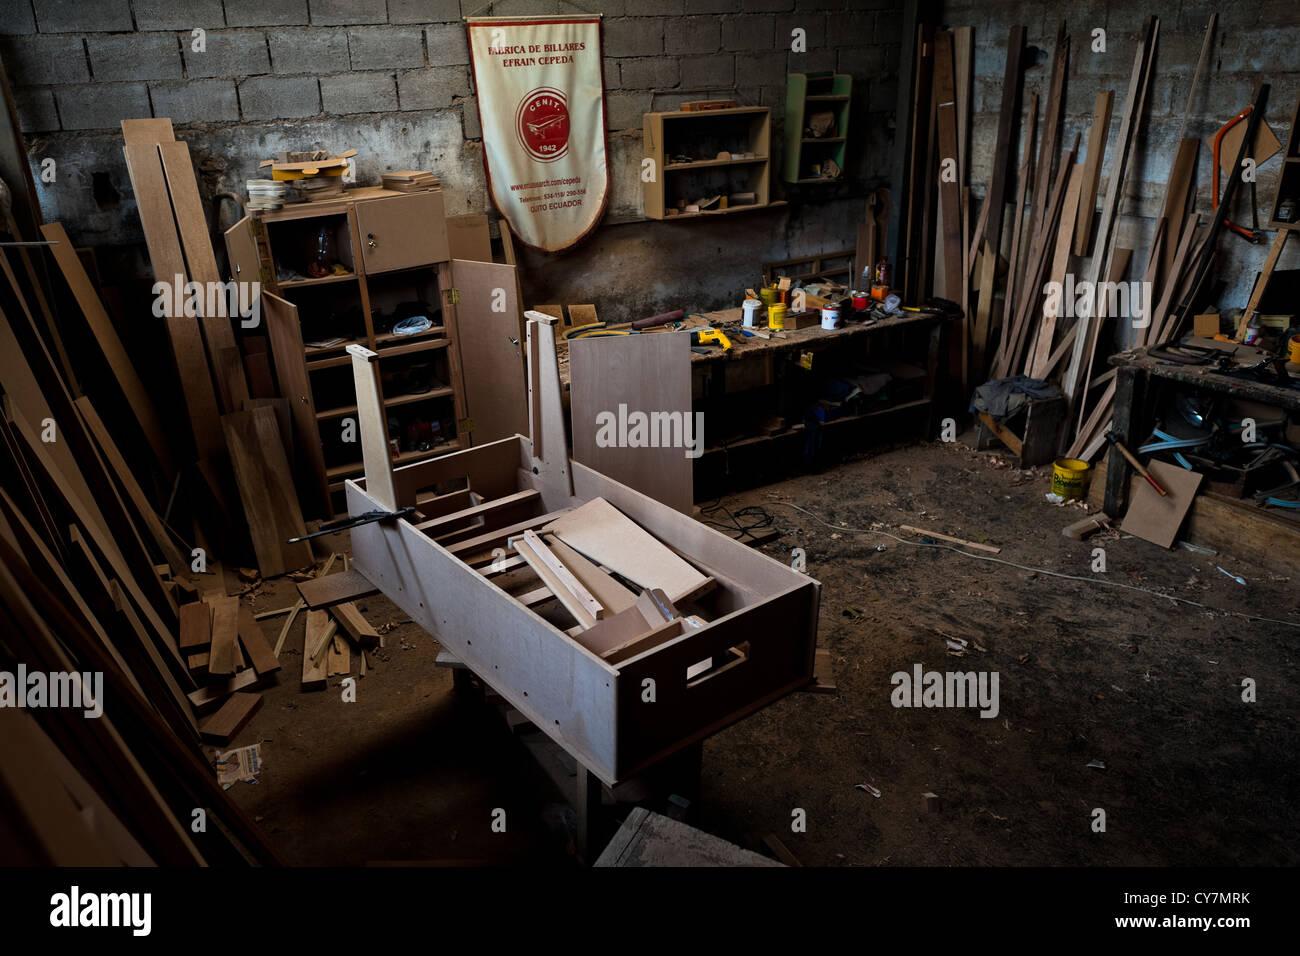 Un aglomerado inconcluso caso visto en un futbolín taller realizado en Quito, Ecuador. Imagen De Stock